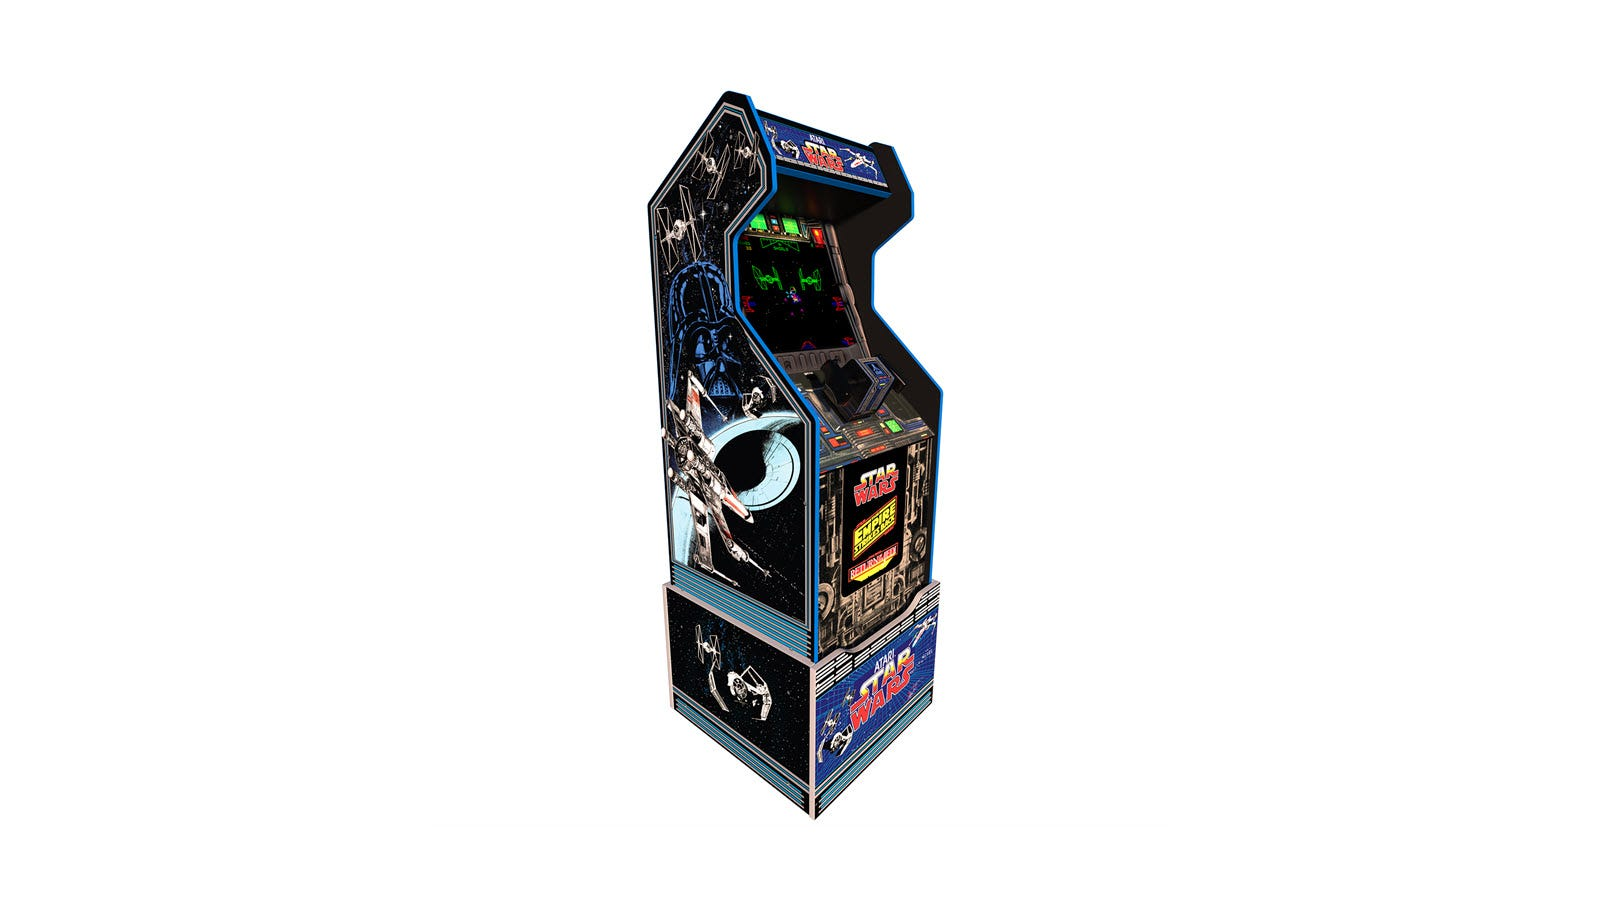 The Star Wars arcade machine, complete with custom riser and flight yoke.